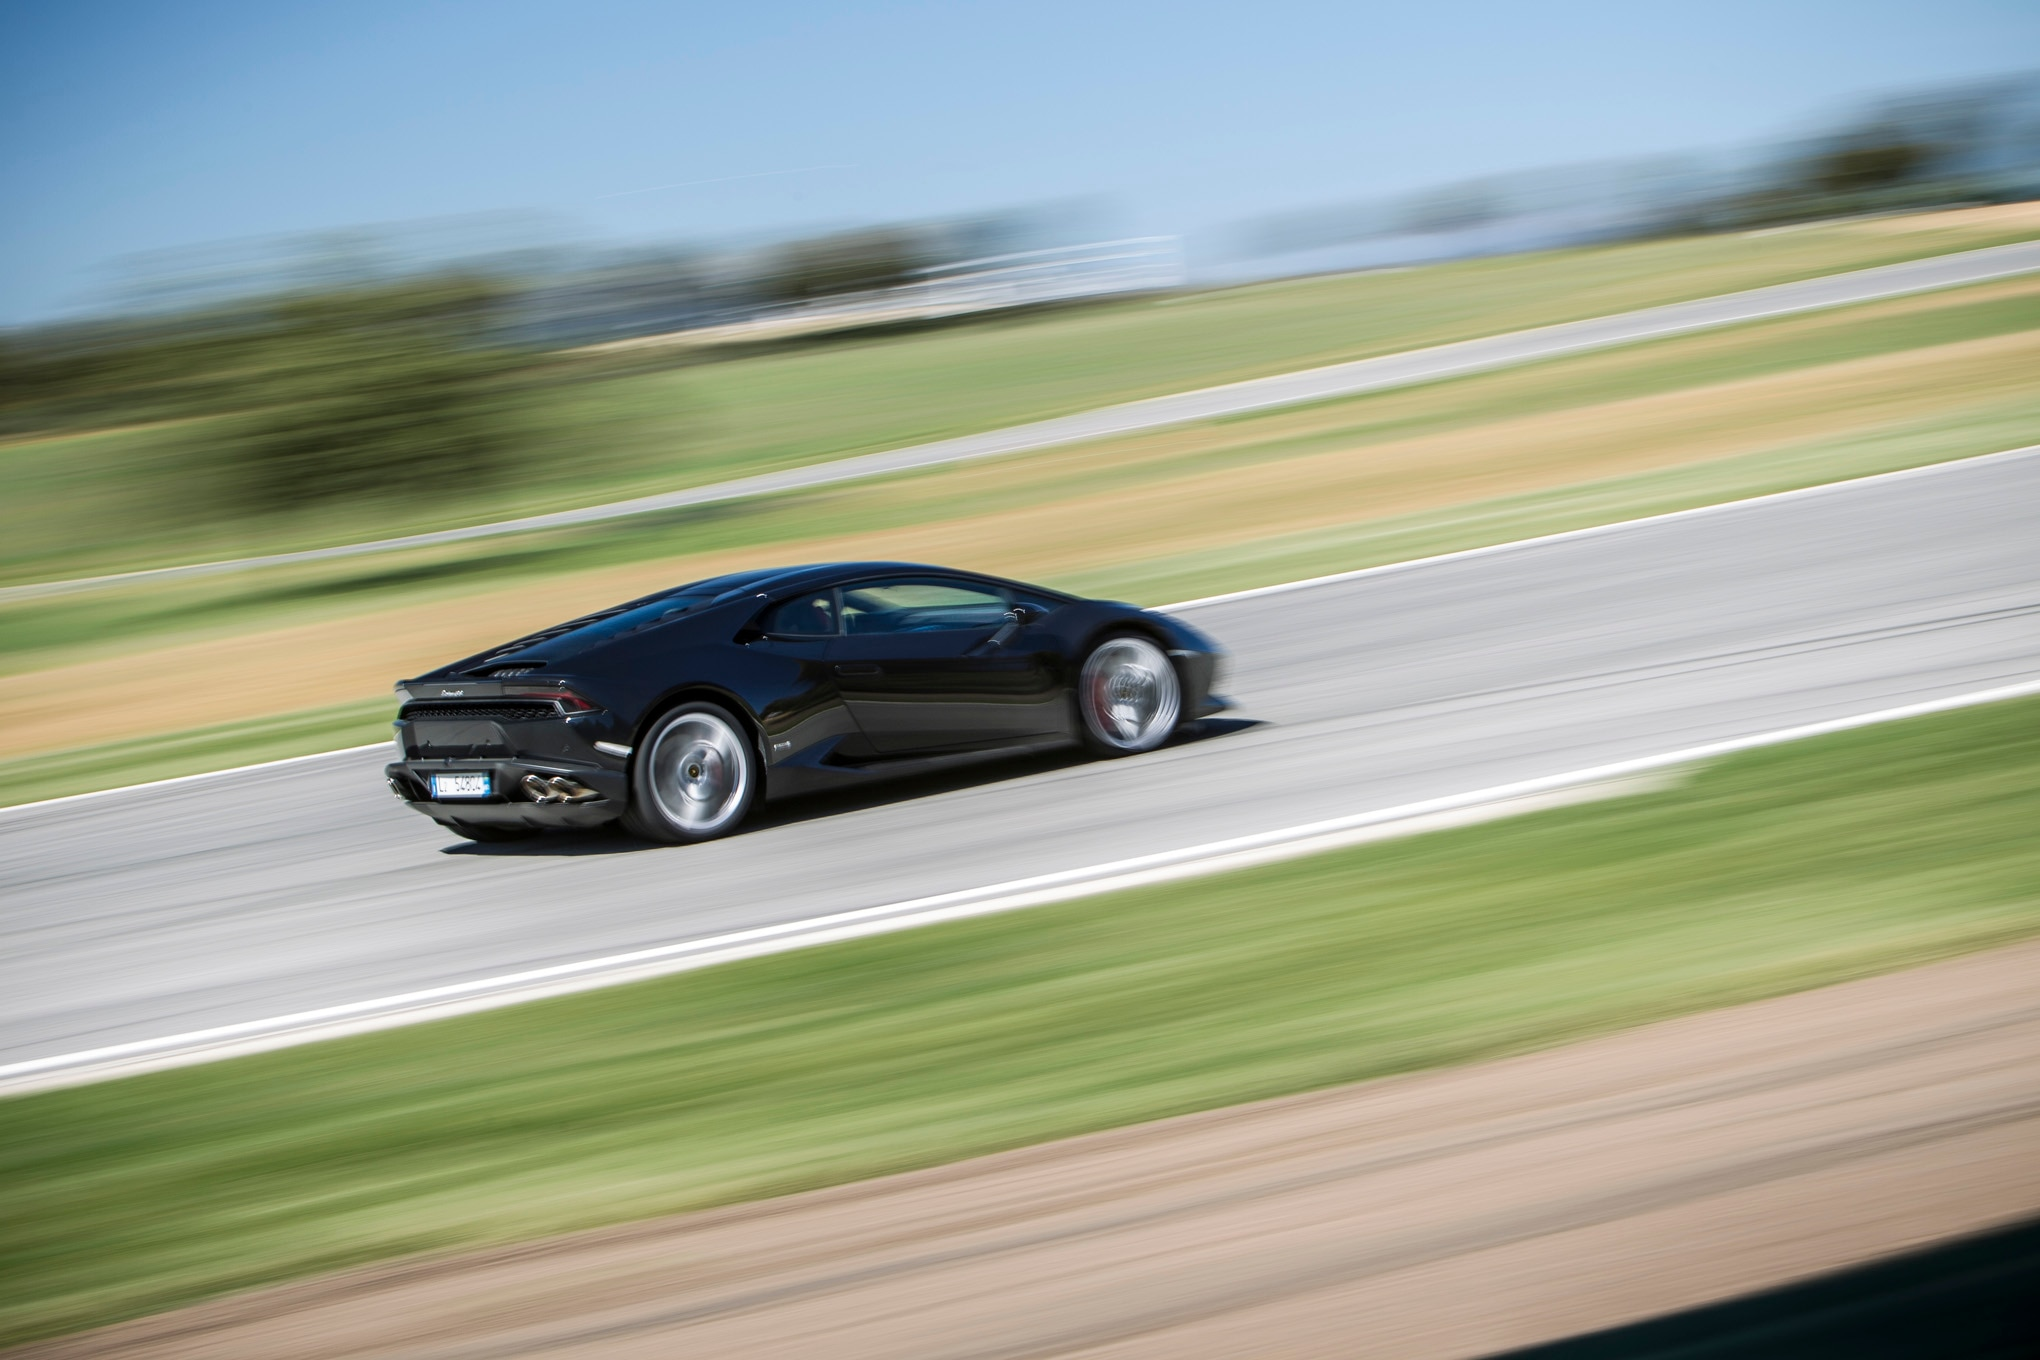 2015-Lamborghini-Huracan-LP-610-4-track-black-side-in-motion Amazing 2015 Lamborghini Huracan Price Per Month Cars Trend